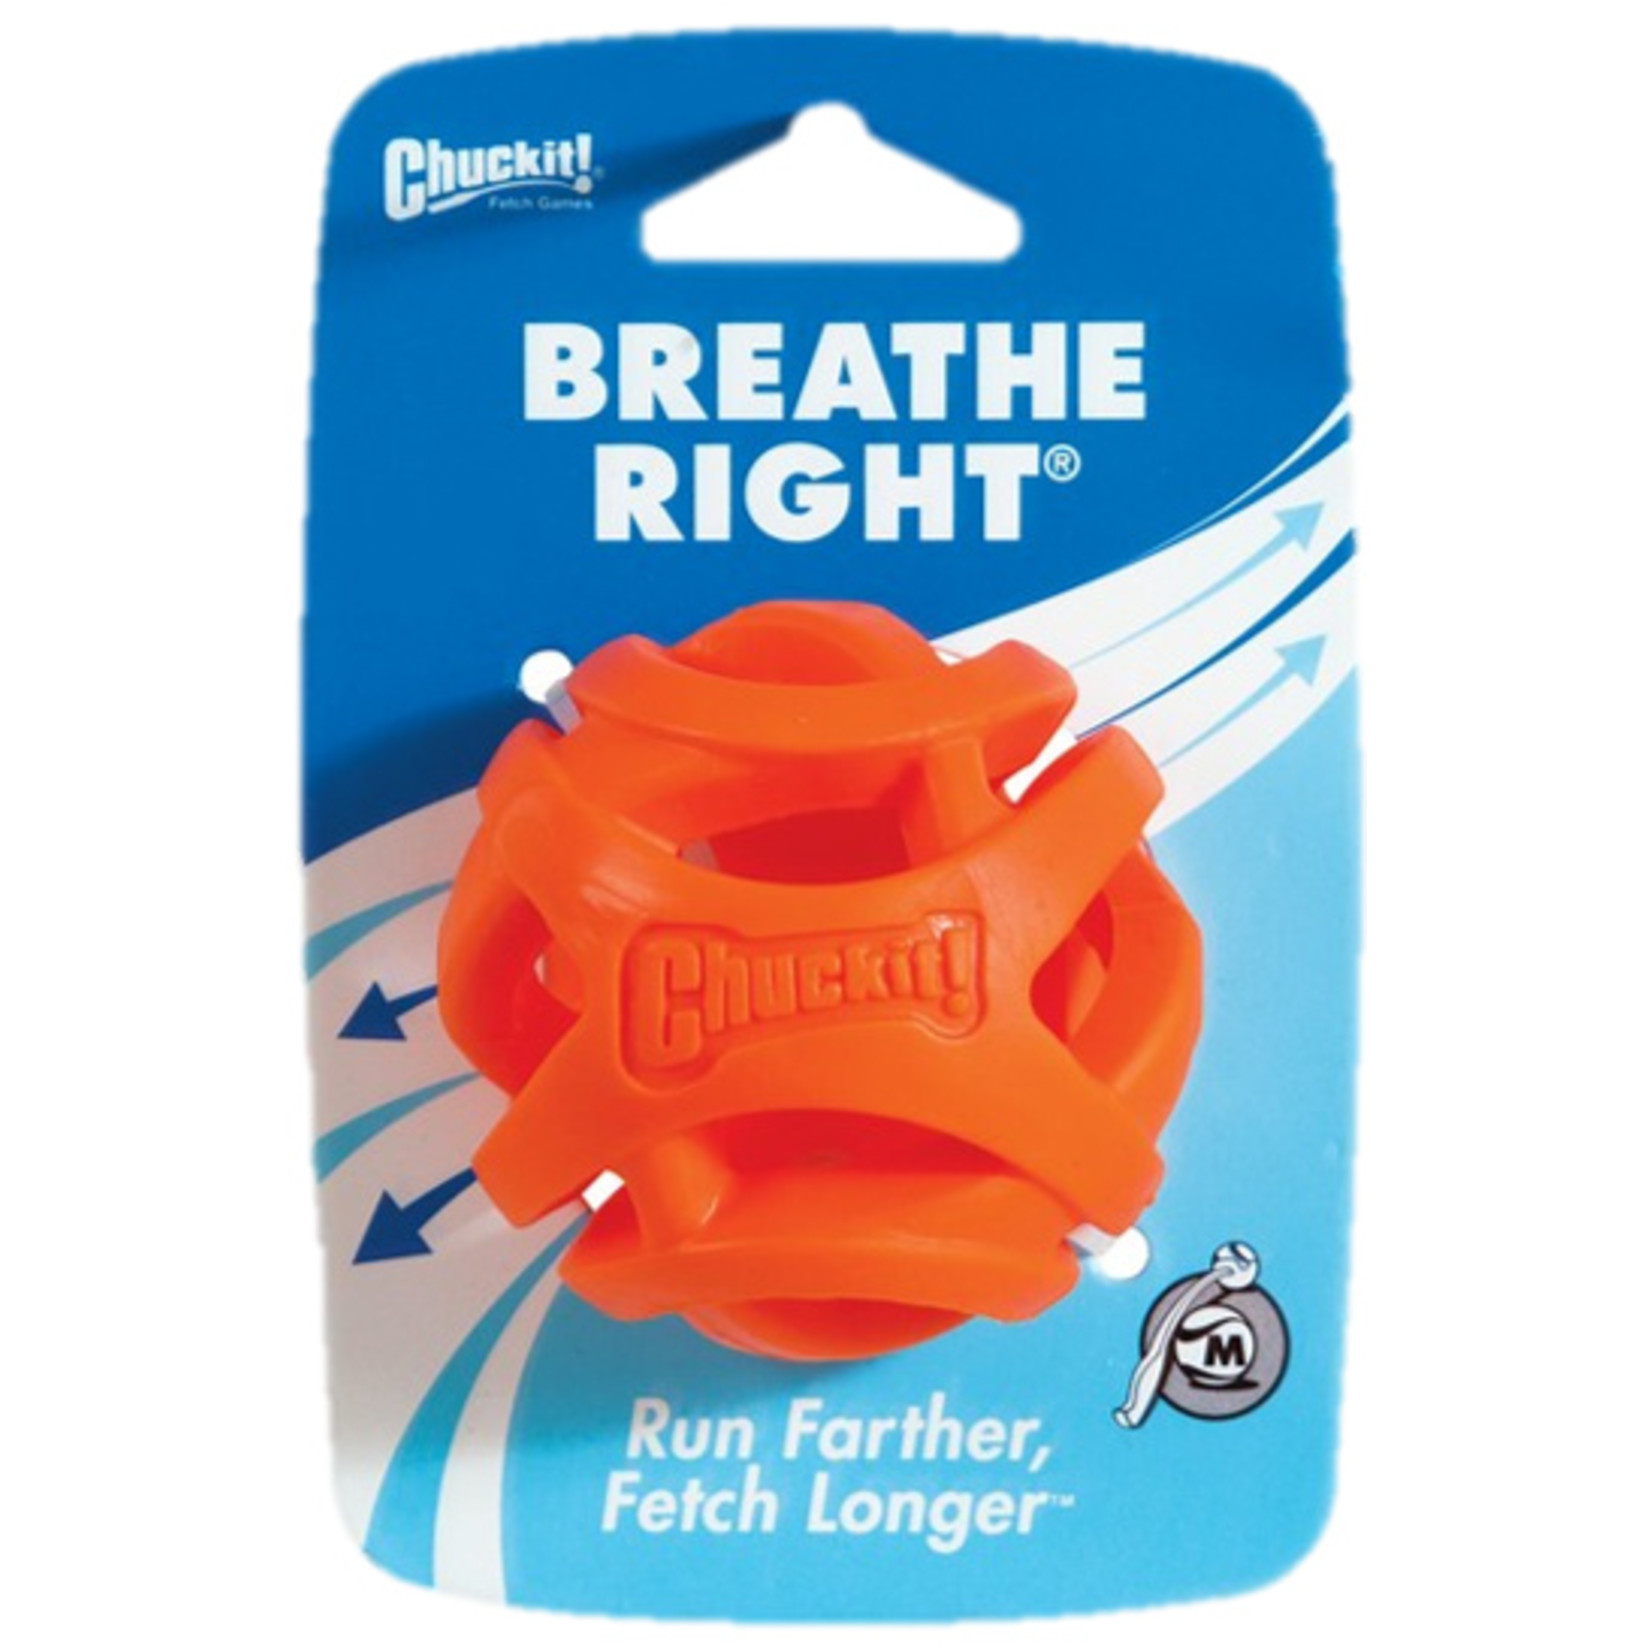 Chuckit! Breathe Right Fetch Ball Dog Toy, Medium 5.5cm